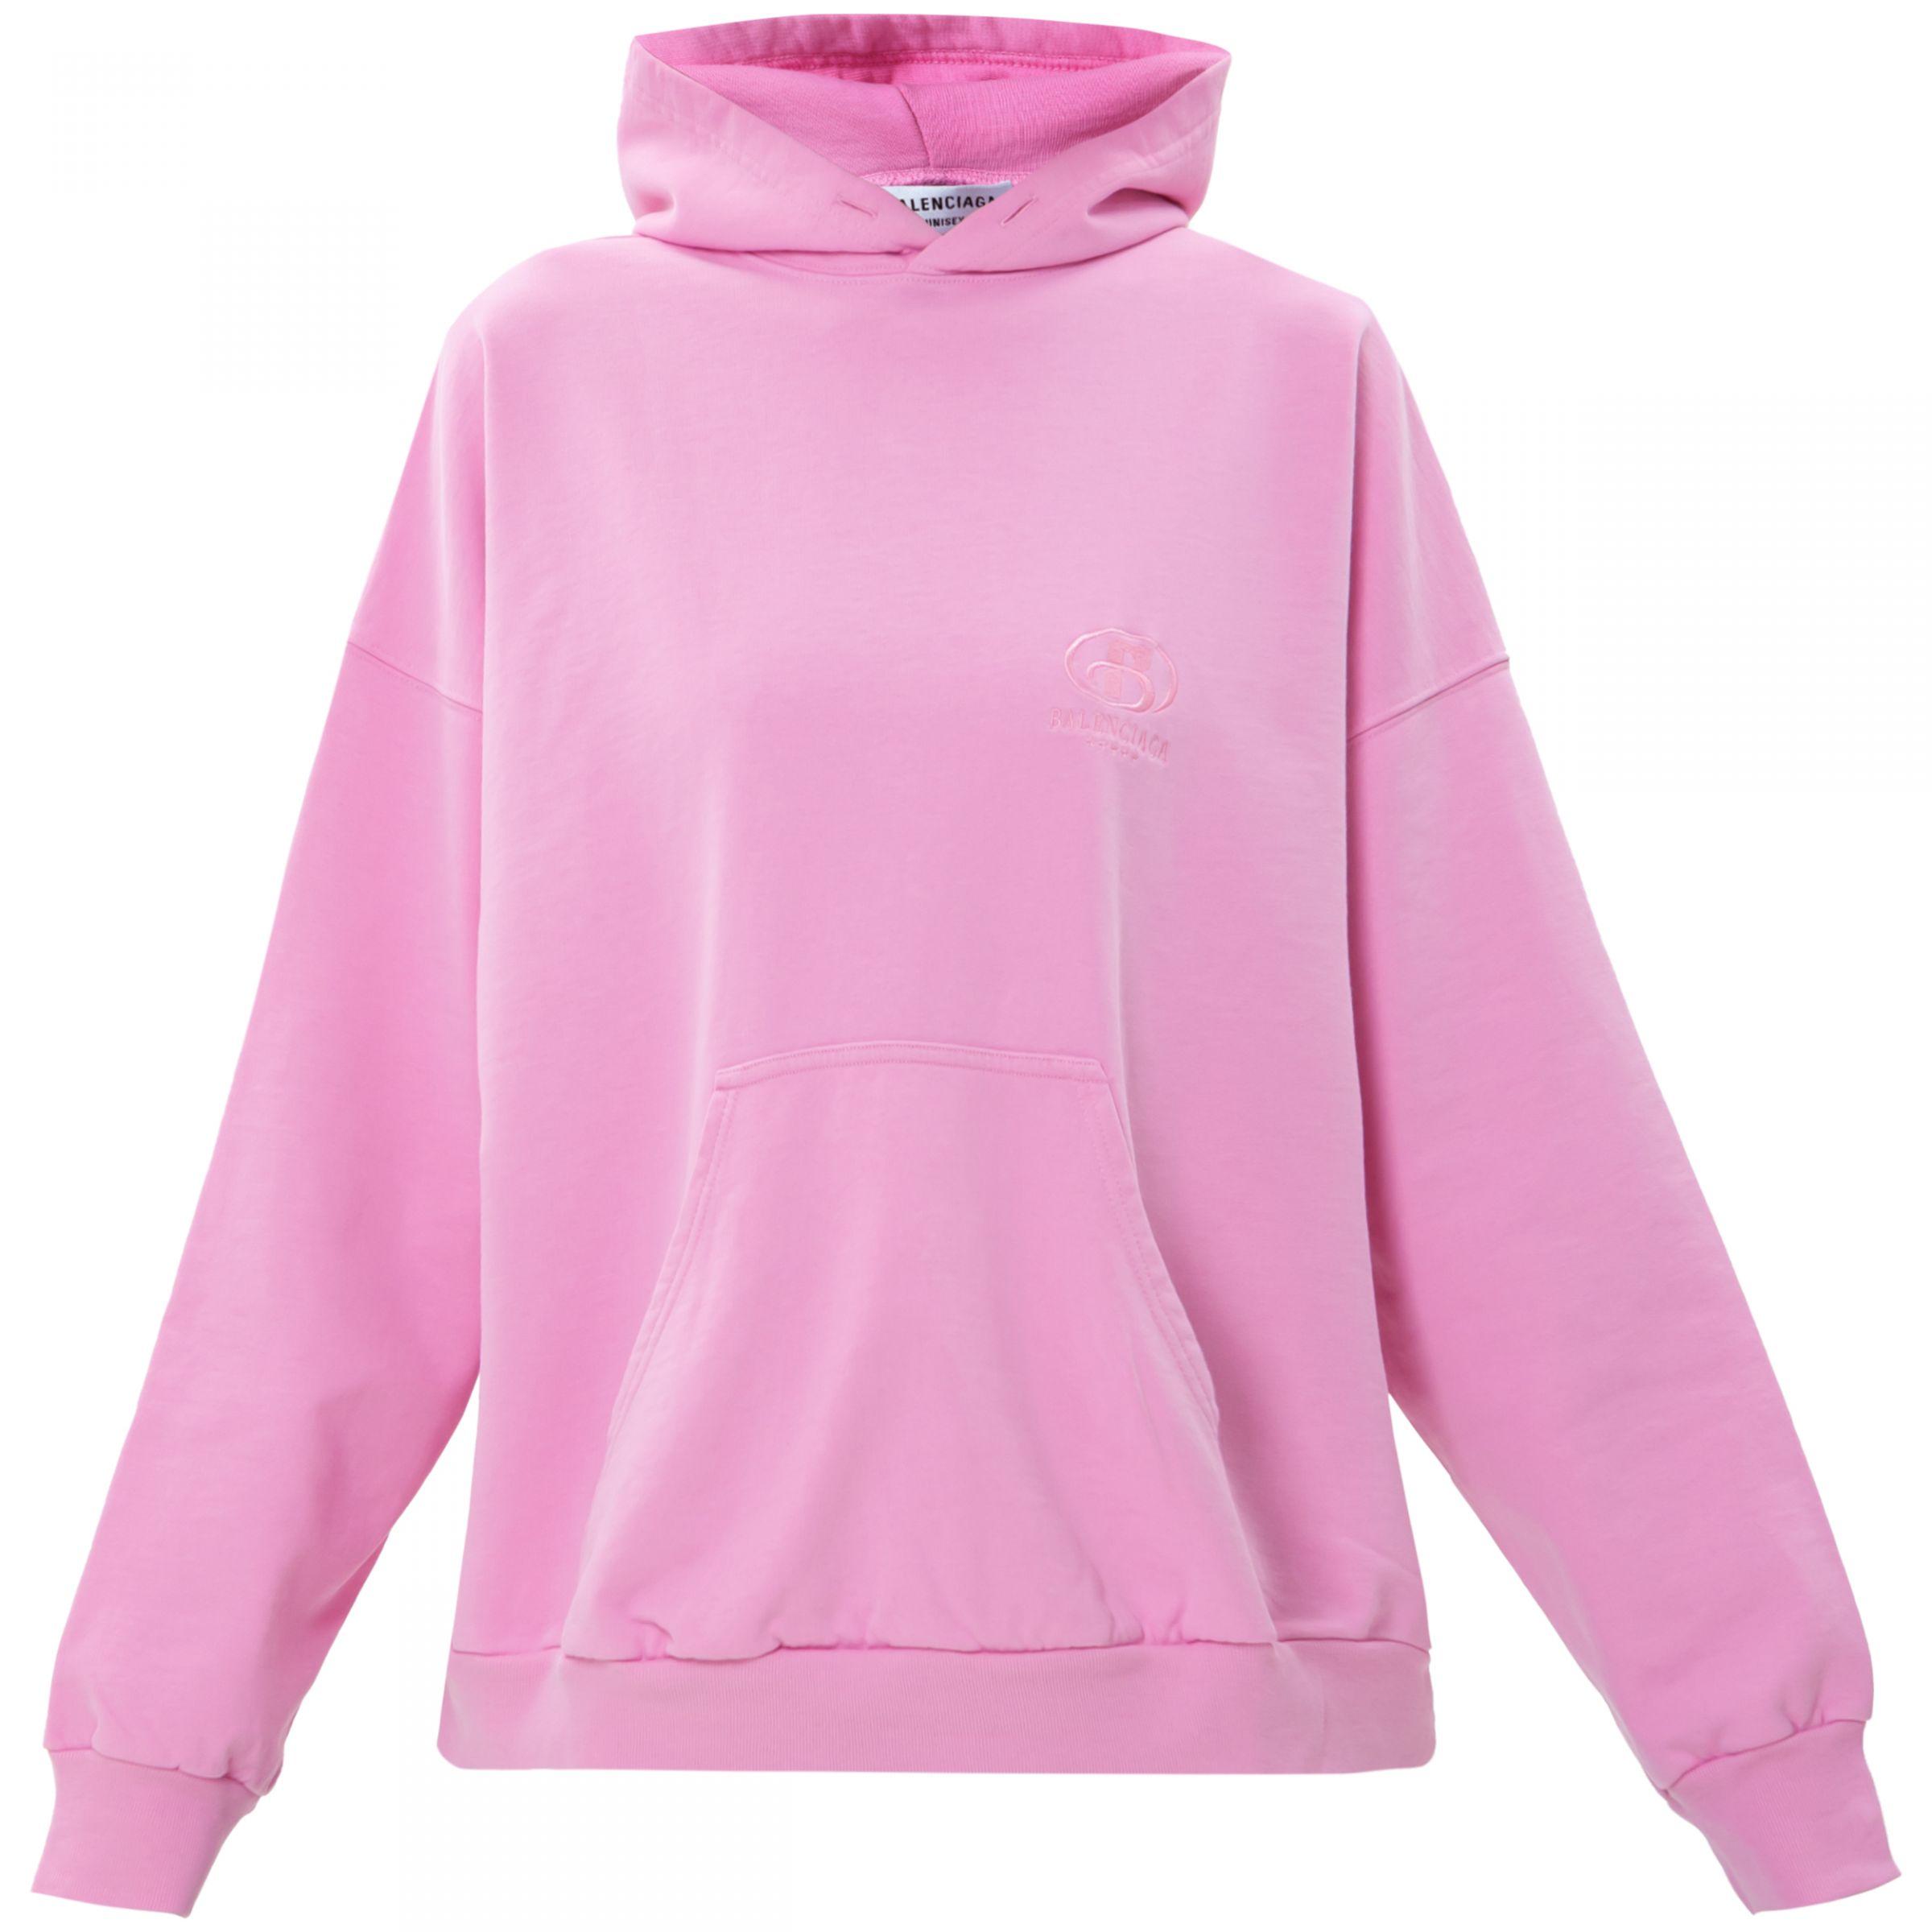 Худи Balenciaga SPA розовое